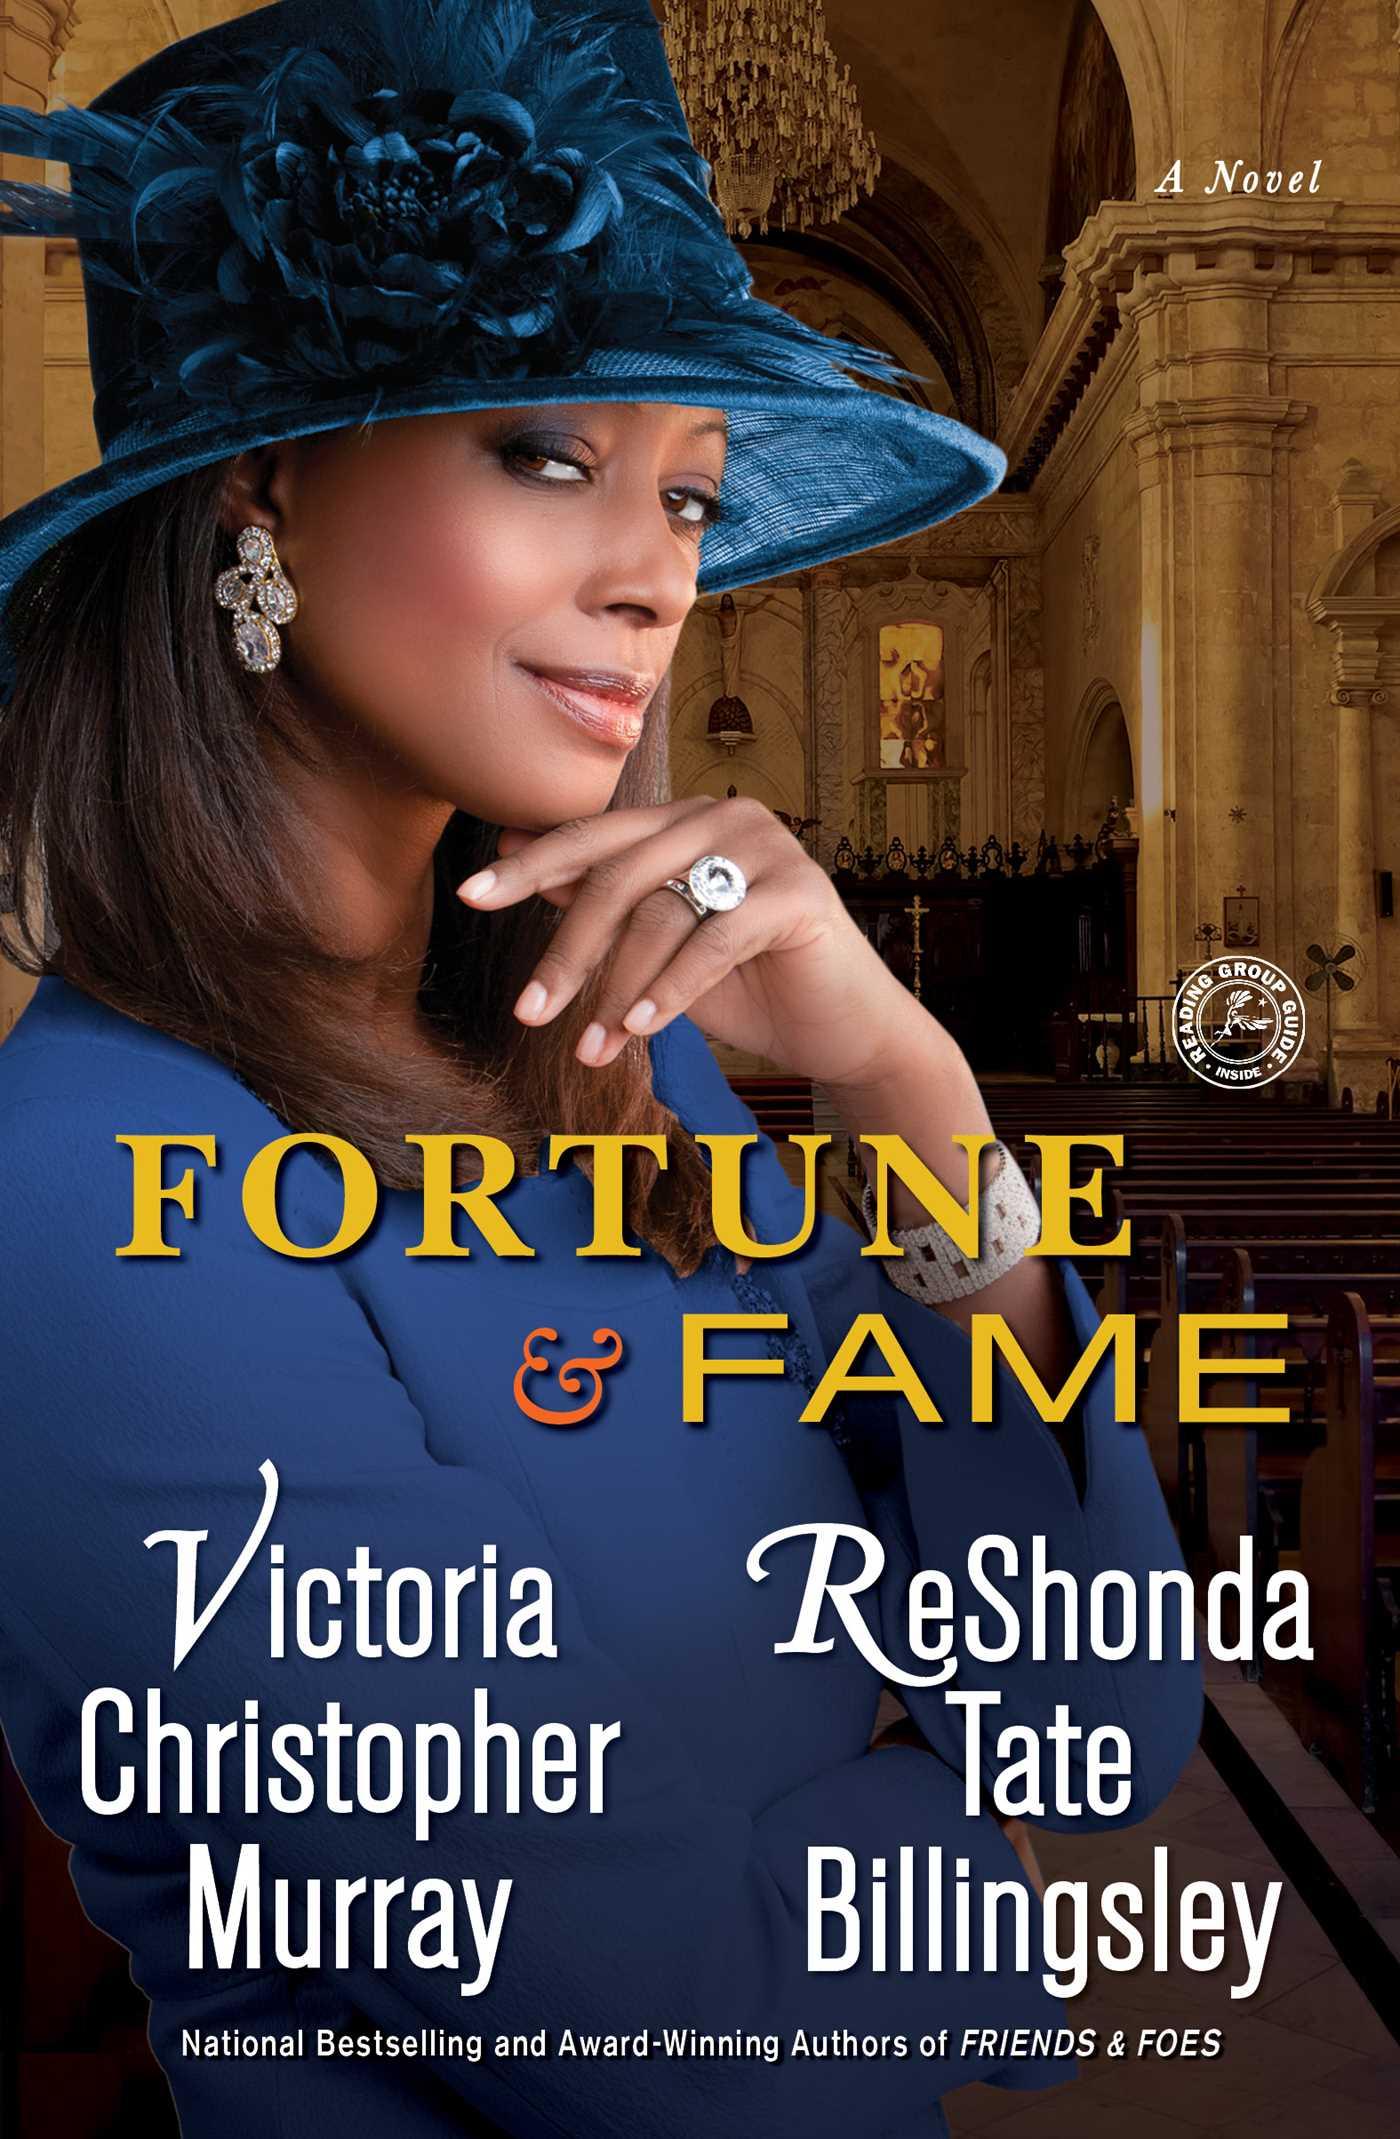 Fortune fame 9781476747187 hr